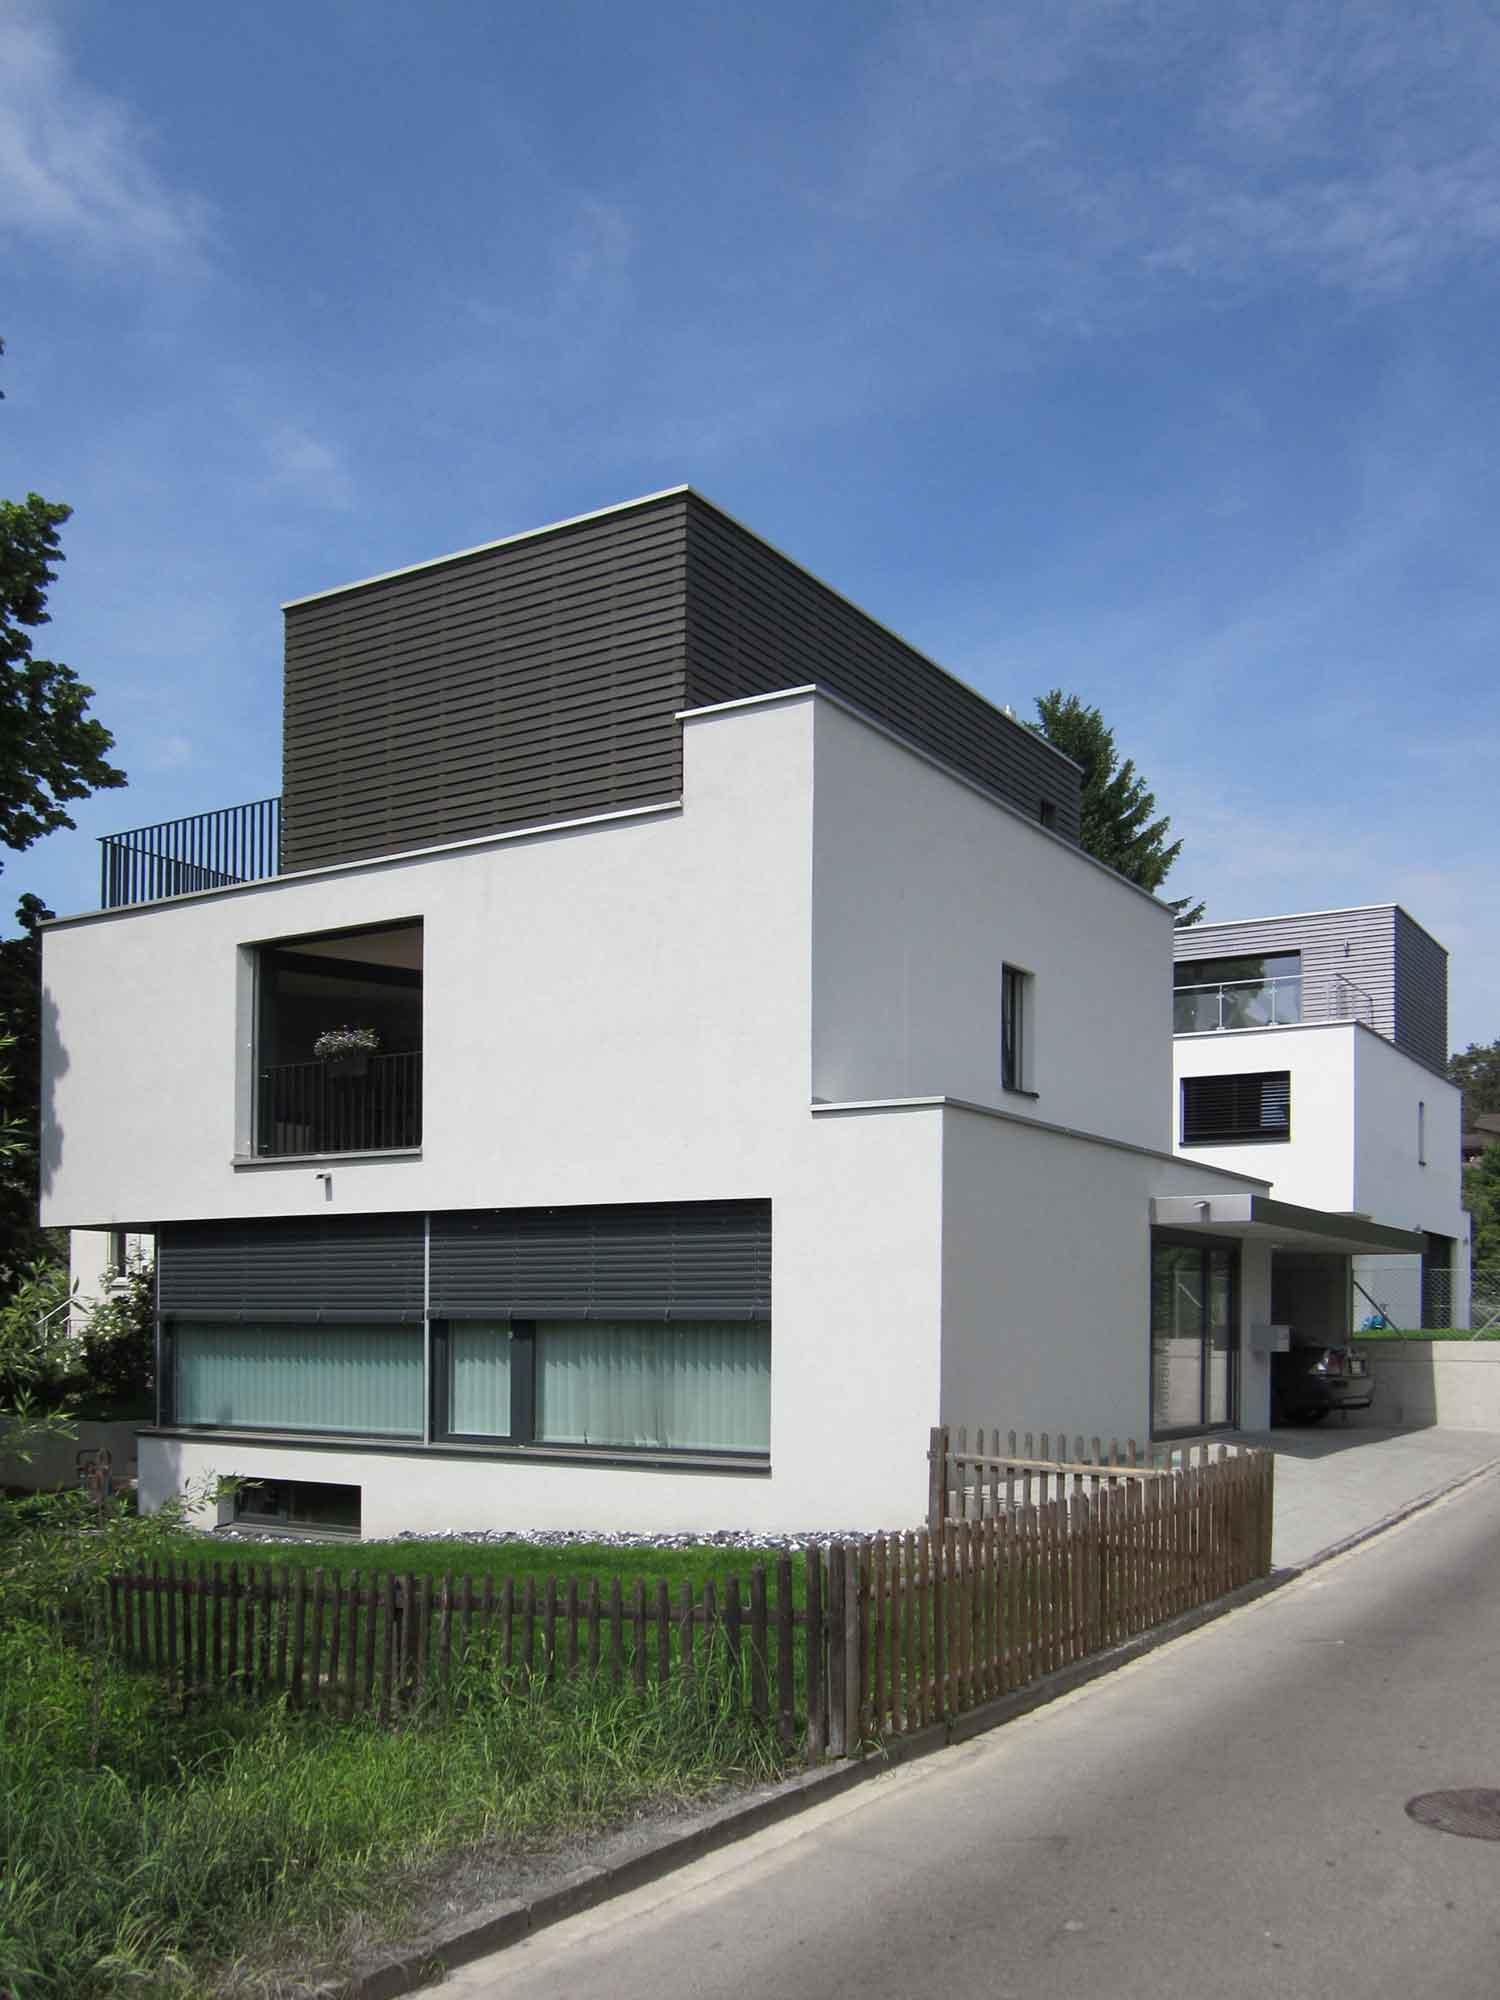 Architektur bauten frisina basel - Architektur basel ...